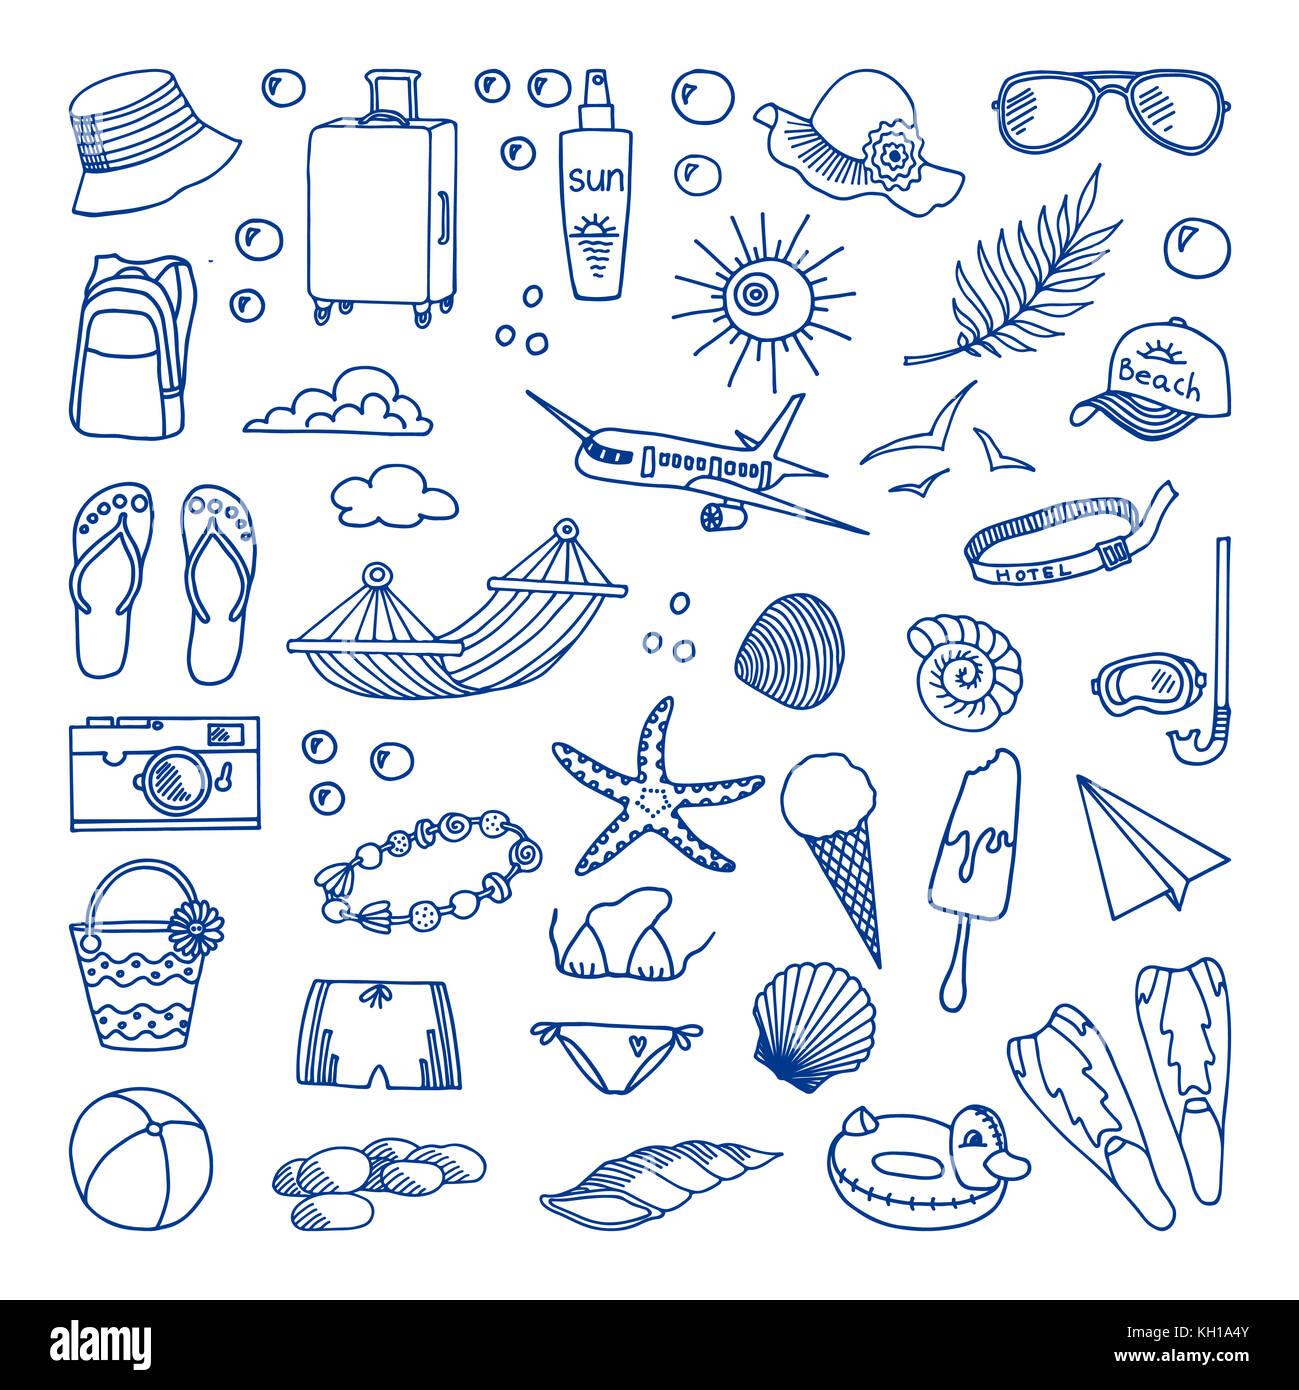 Seaside holidays. illustration. Sunglasses and sunscreen, ice cream, slates, hammock. The concept of summer holidays. - Stock Image